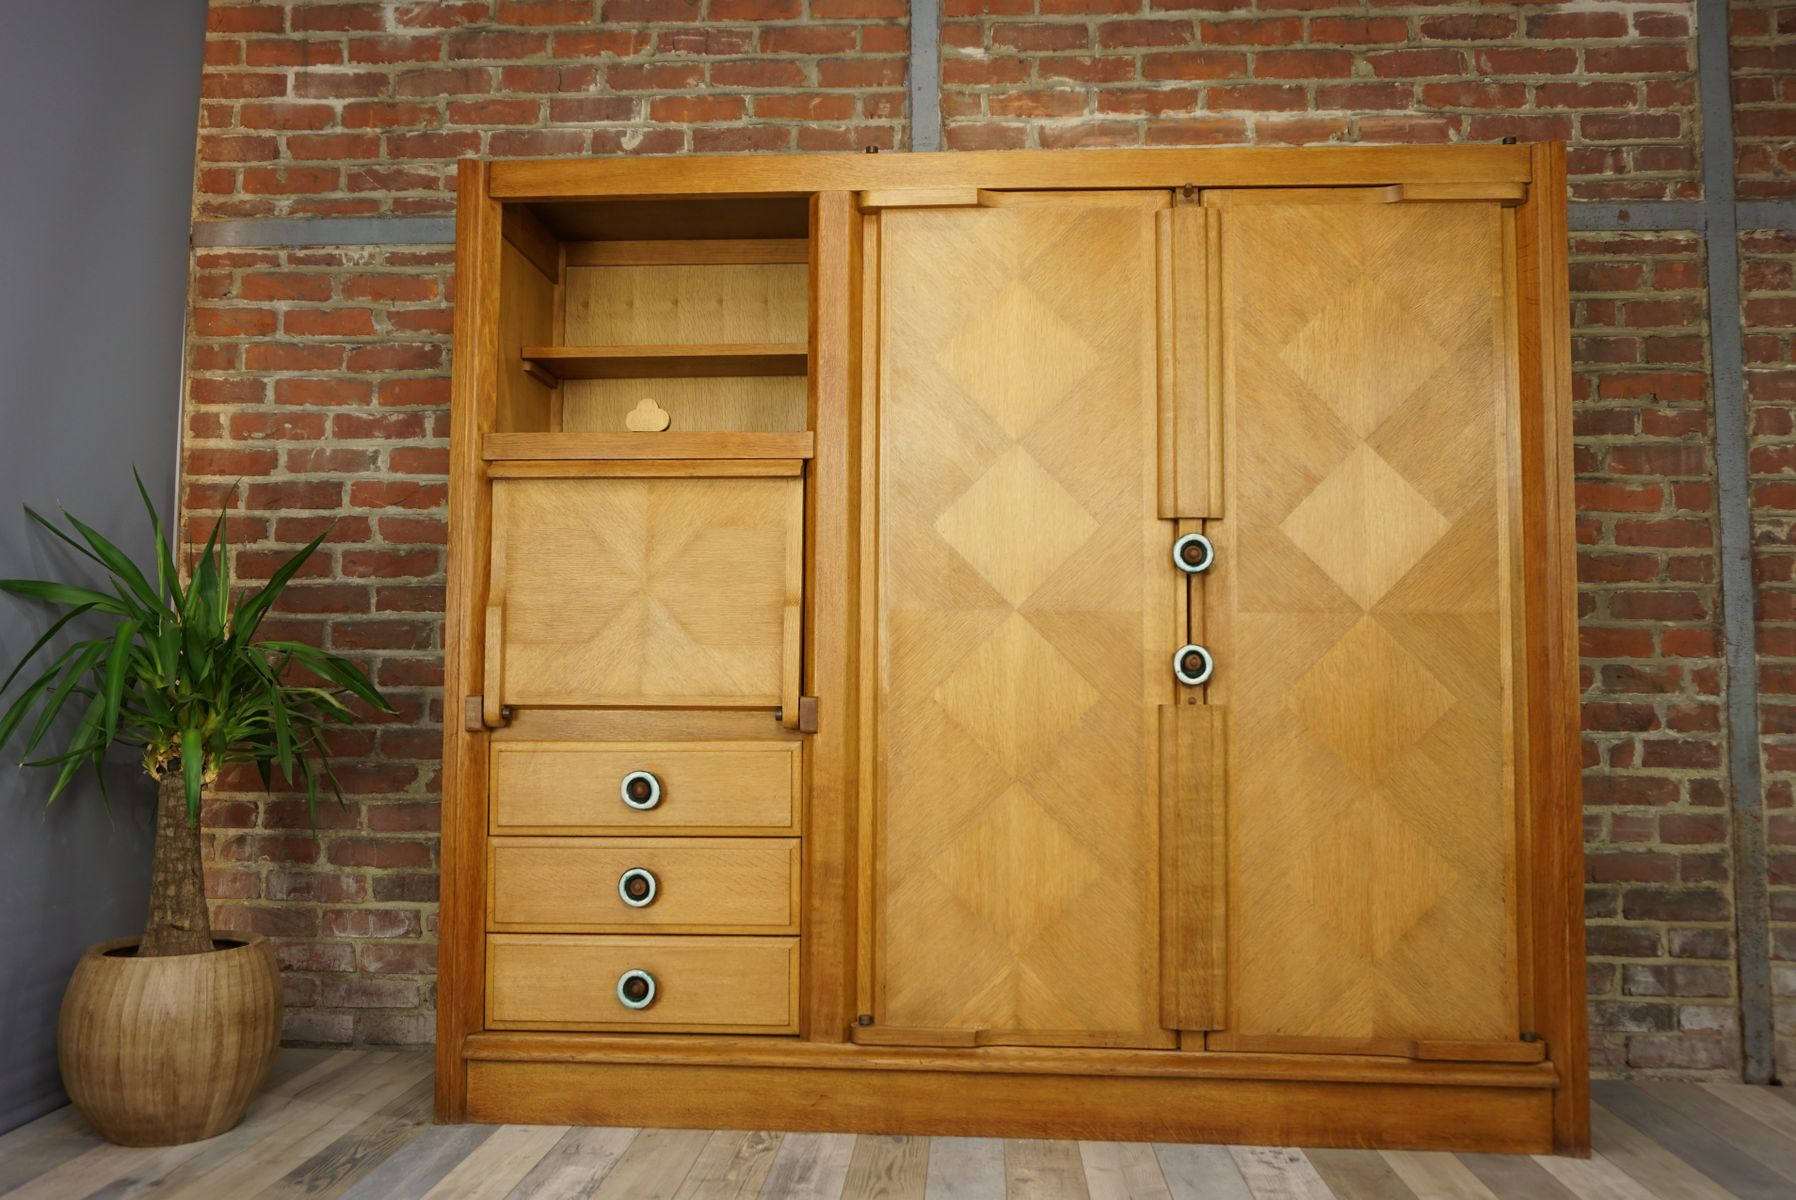 g meau wardrobe by guillerme et chambron for votre maison 1950s for sale at pamono. Black Bedroom Furniture Sets. Home Design Ideas